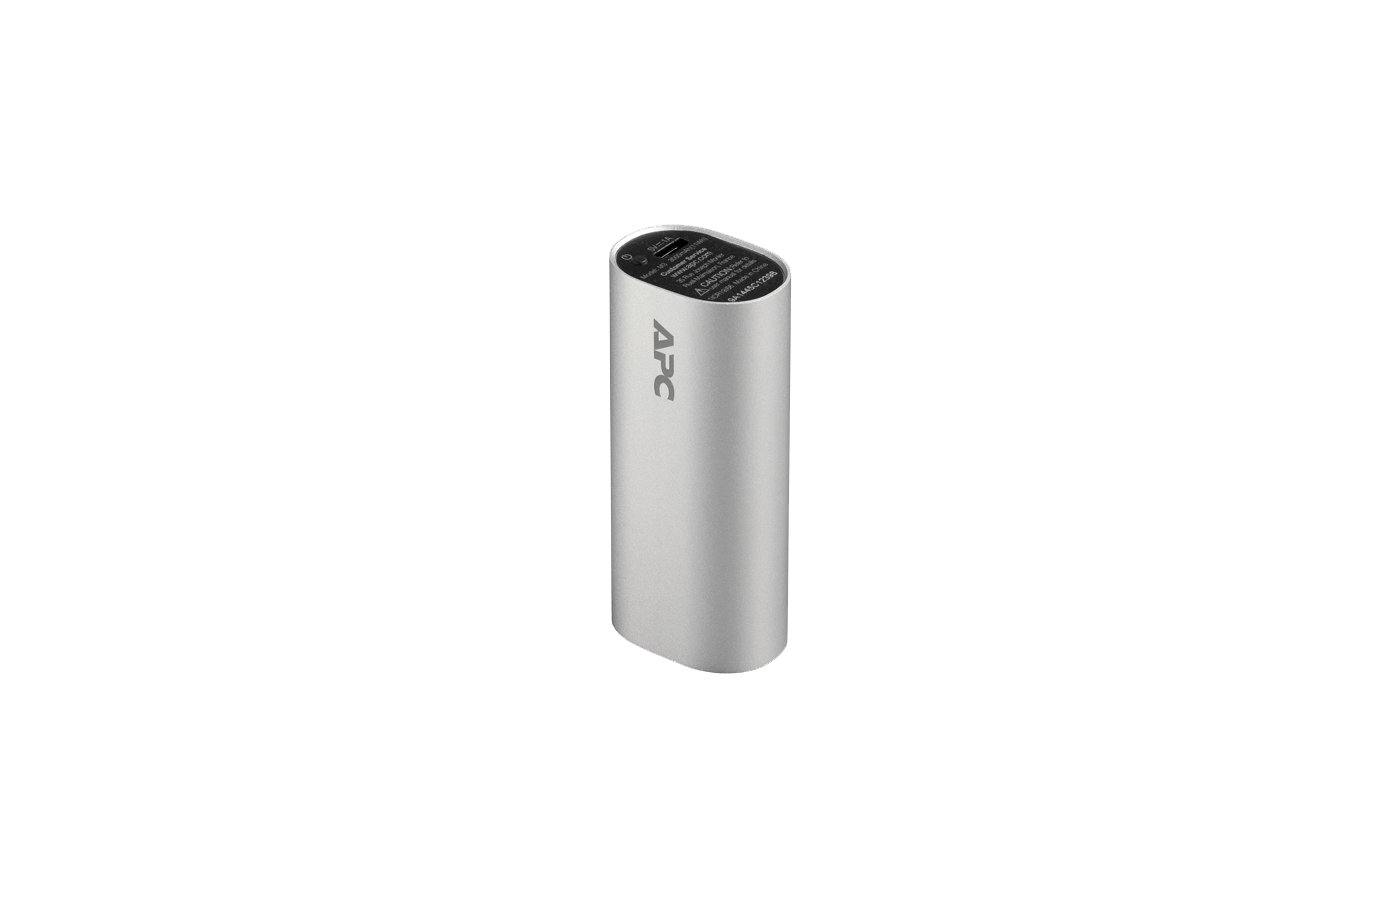 Портативный аккумулятор APC PowerPack M3SR-EC Li-Pol 3000mAh 1A серебристый